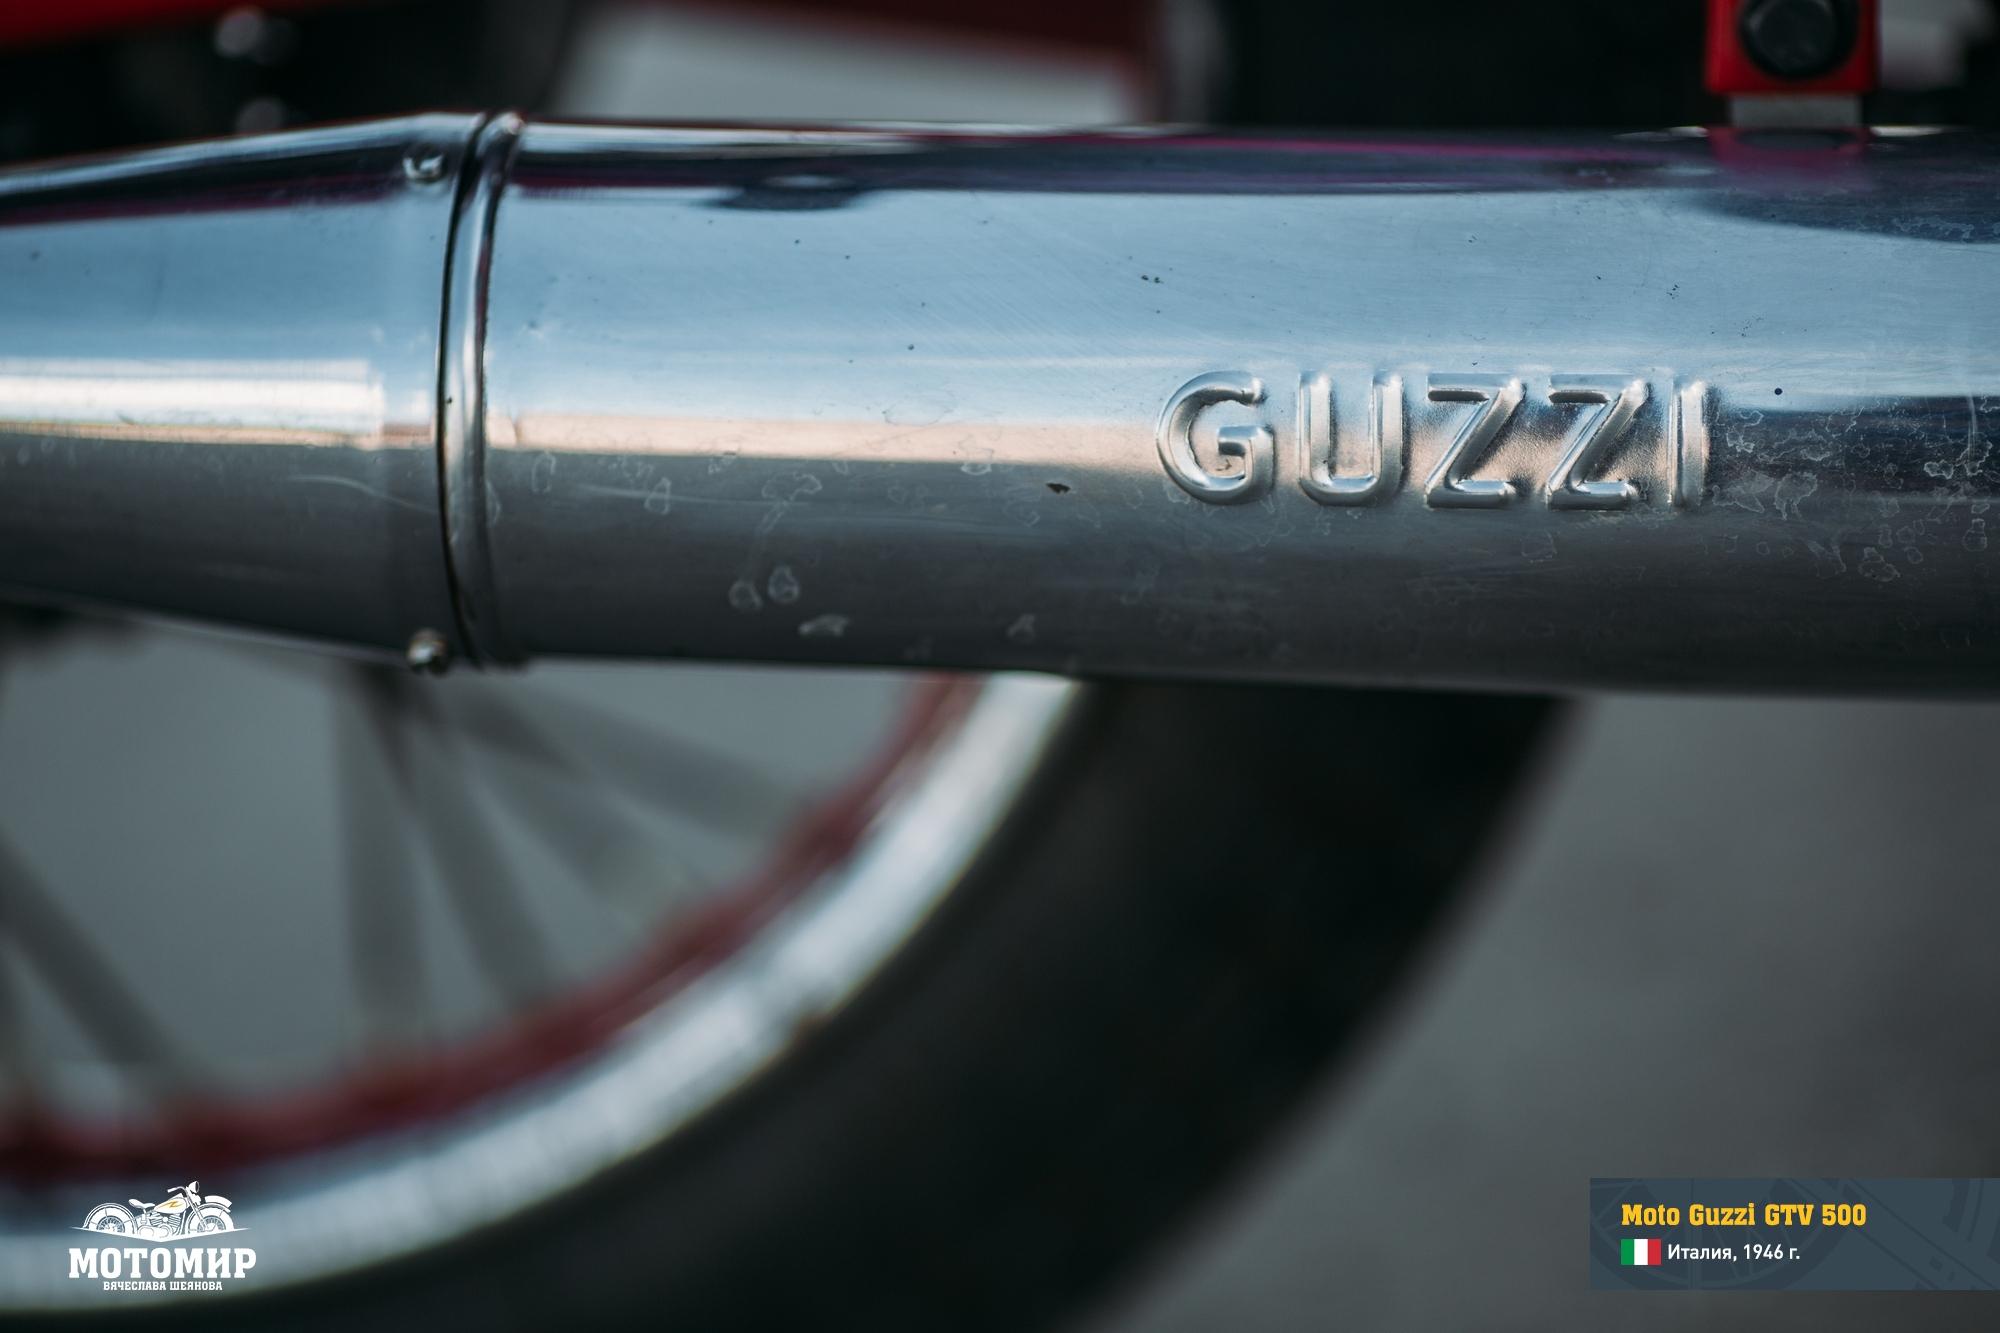 moto-guzzi-gtv-500-201509-web-13